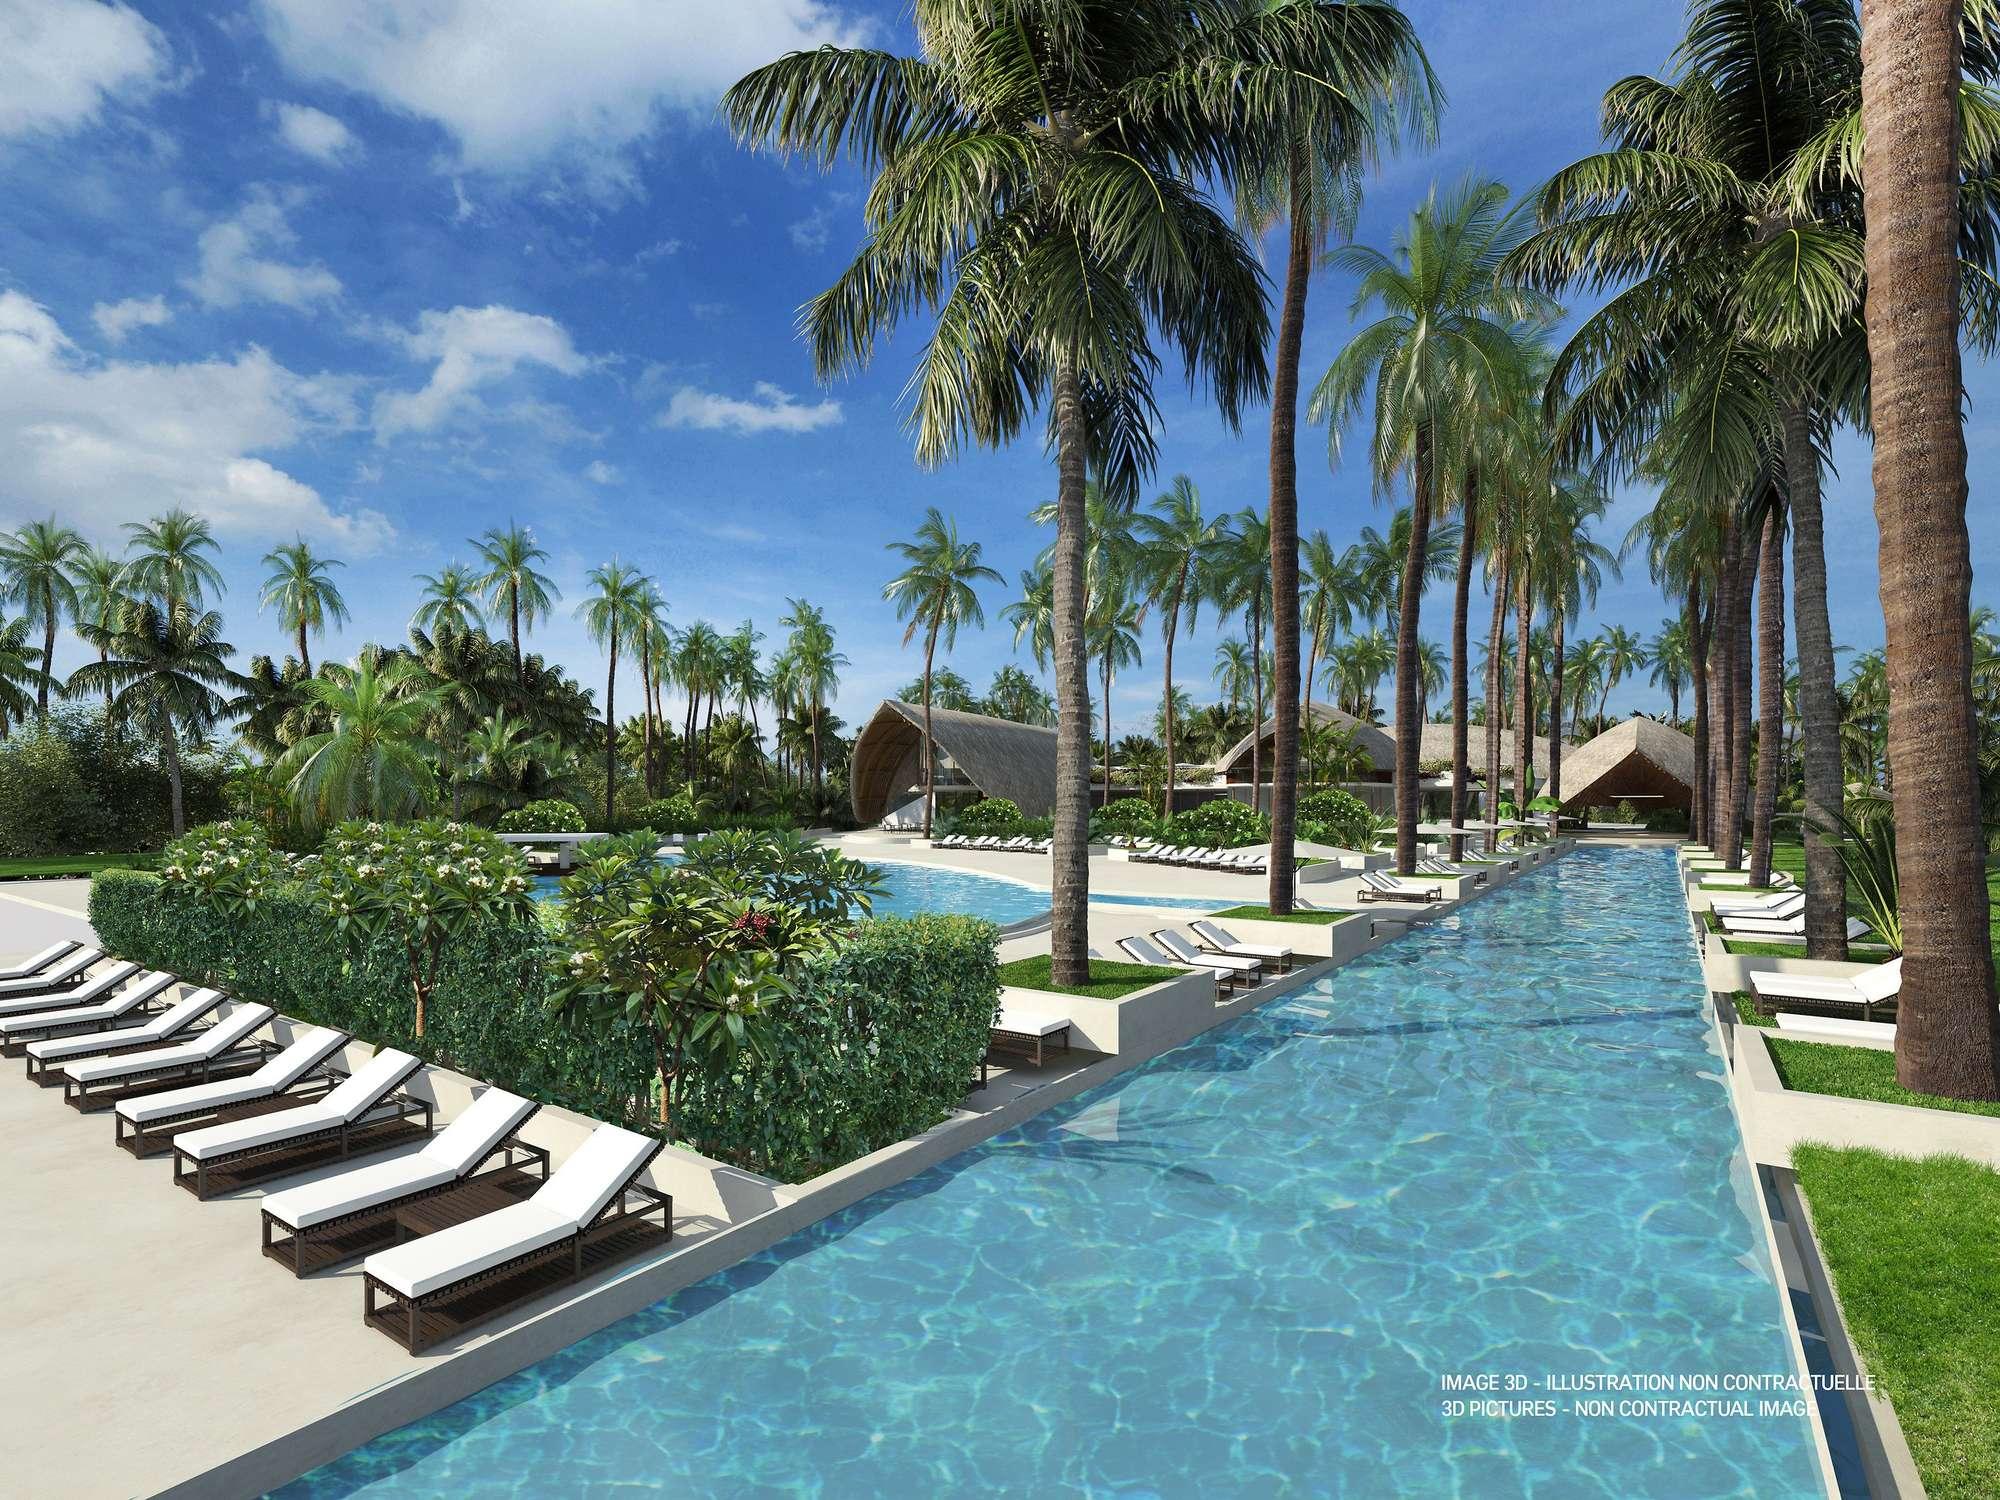 https___ns.clubmed.com_dream_EXCLUSIVE_COLLECTION_Resorts_Miches_Playa_Esmeralda_183325-ibbigsauci-swhr